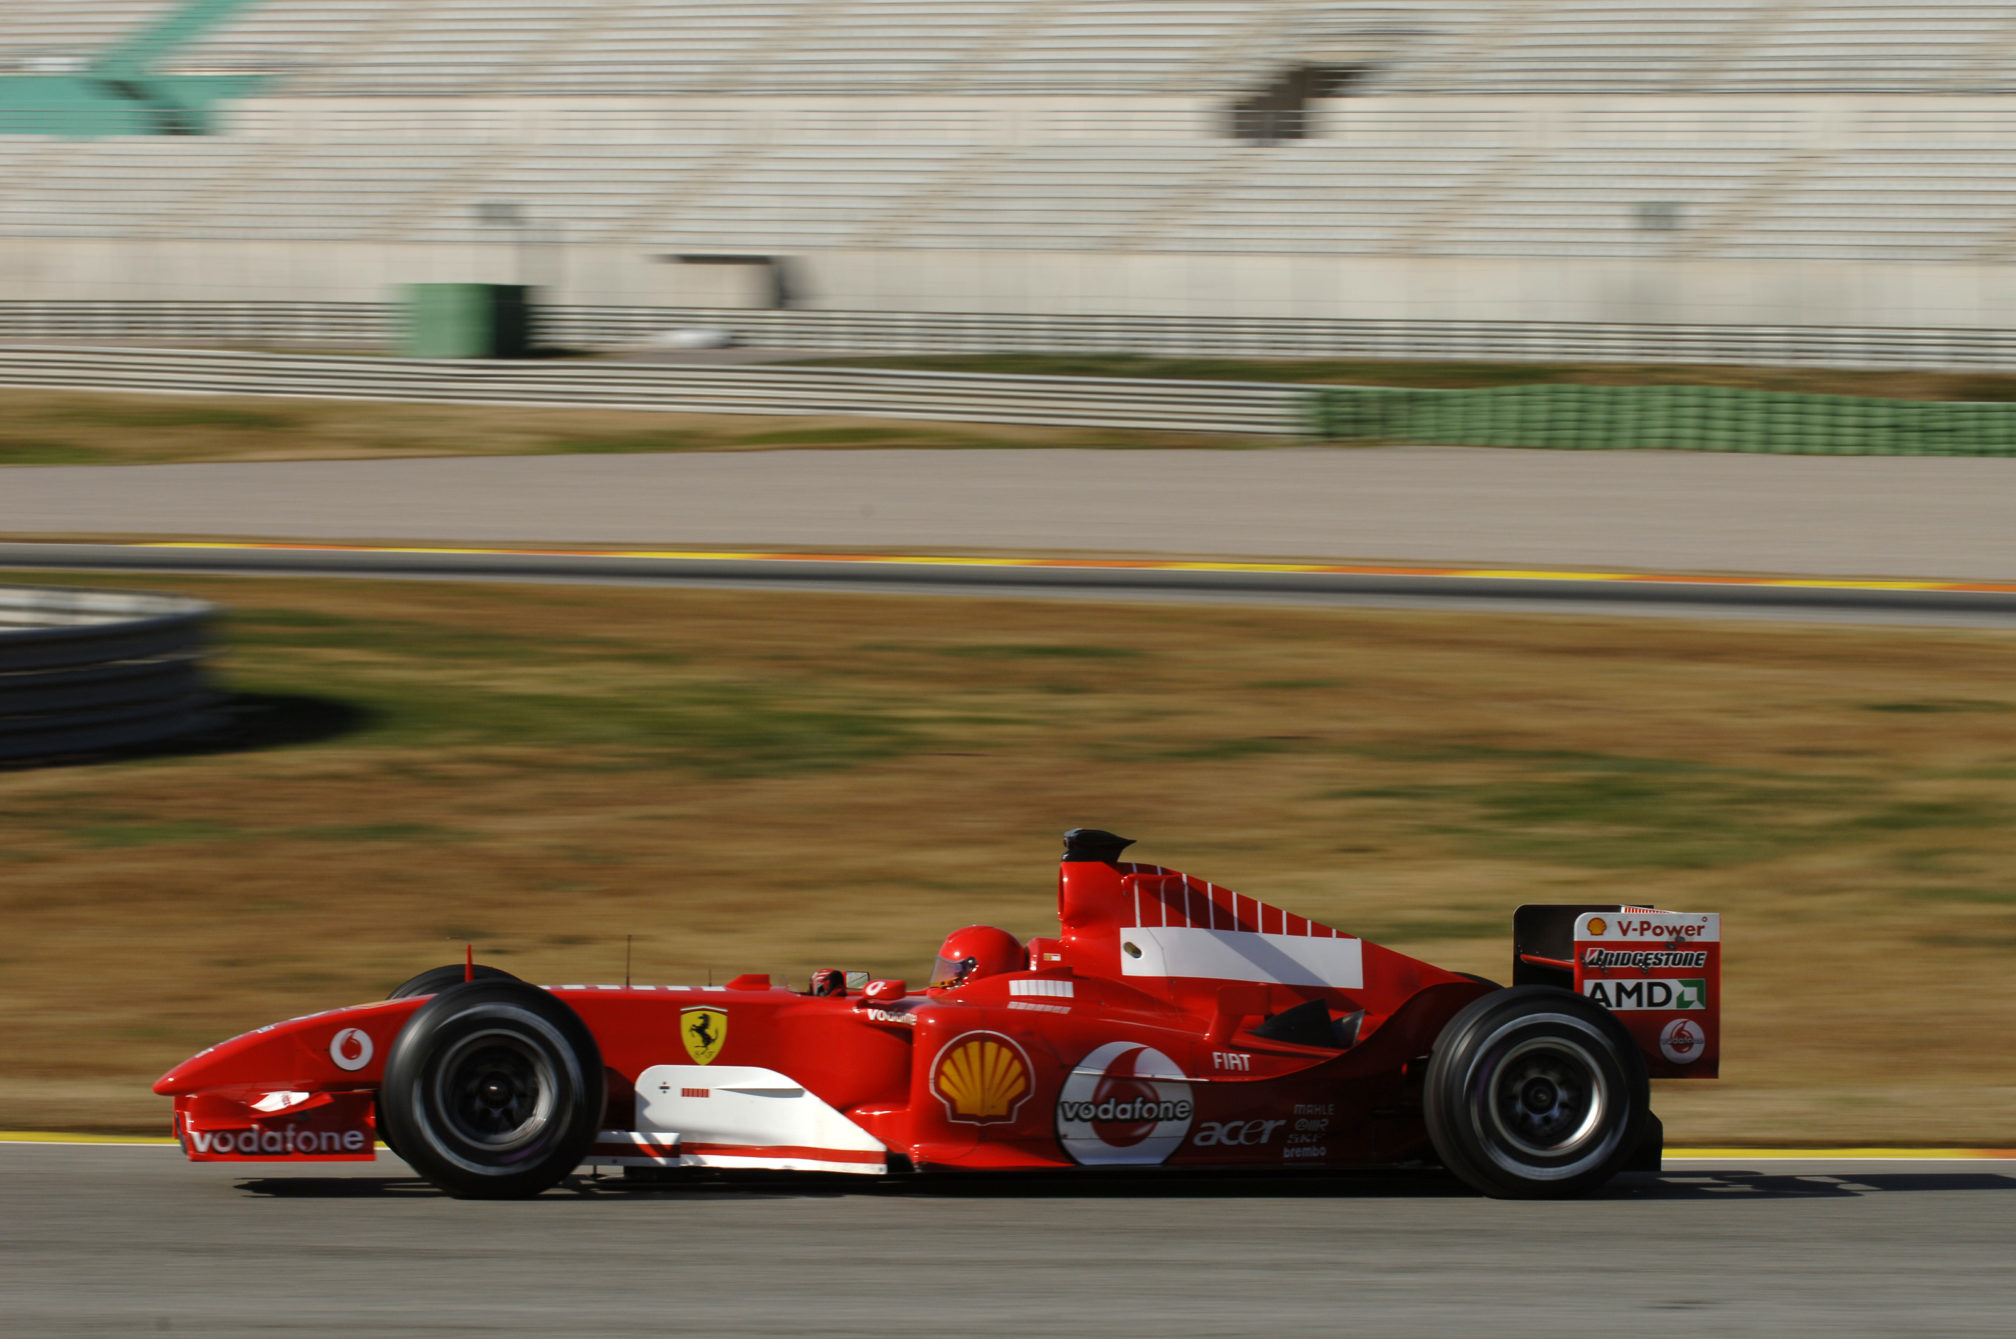 Teste no Ferrari Fórmula 1